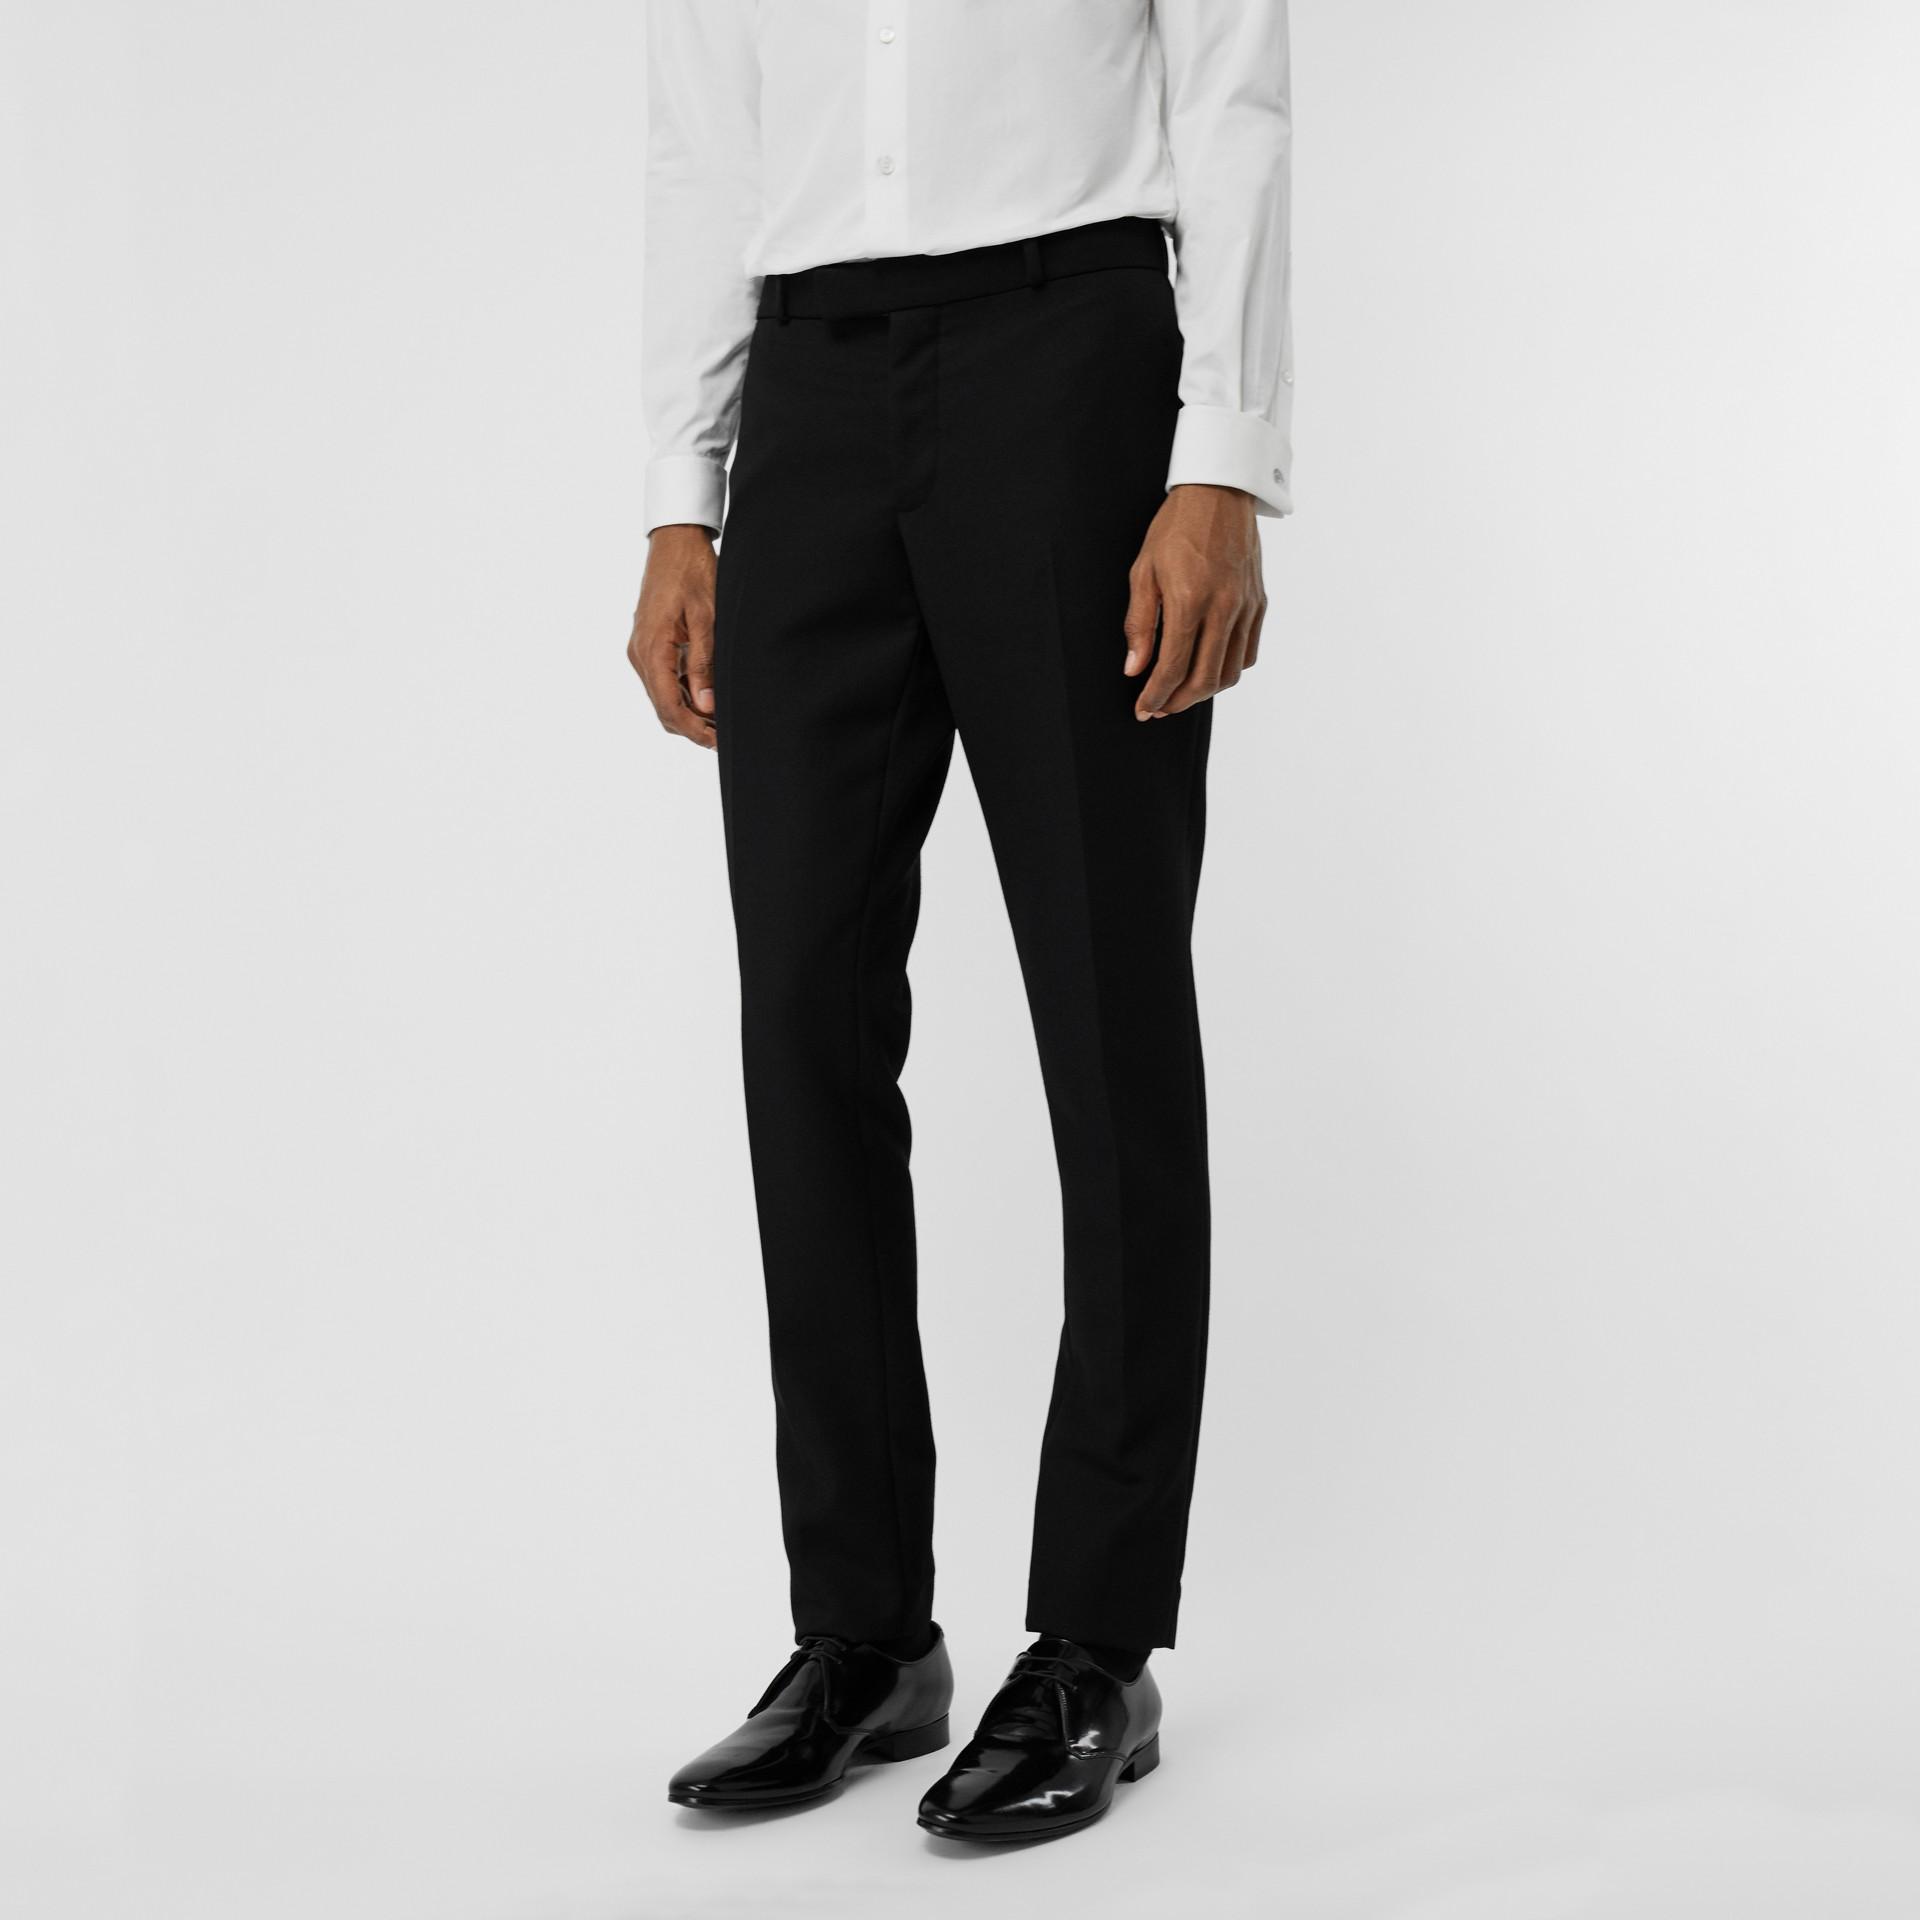 Soho Fit Bullion Stripe Wool Twill Tailored Trousers in Black - Men | Burberry - gallery image 4